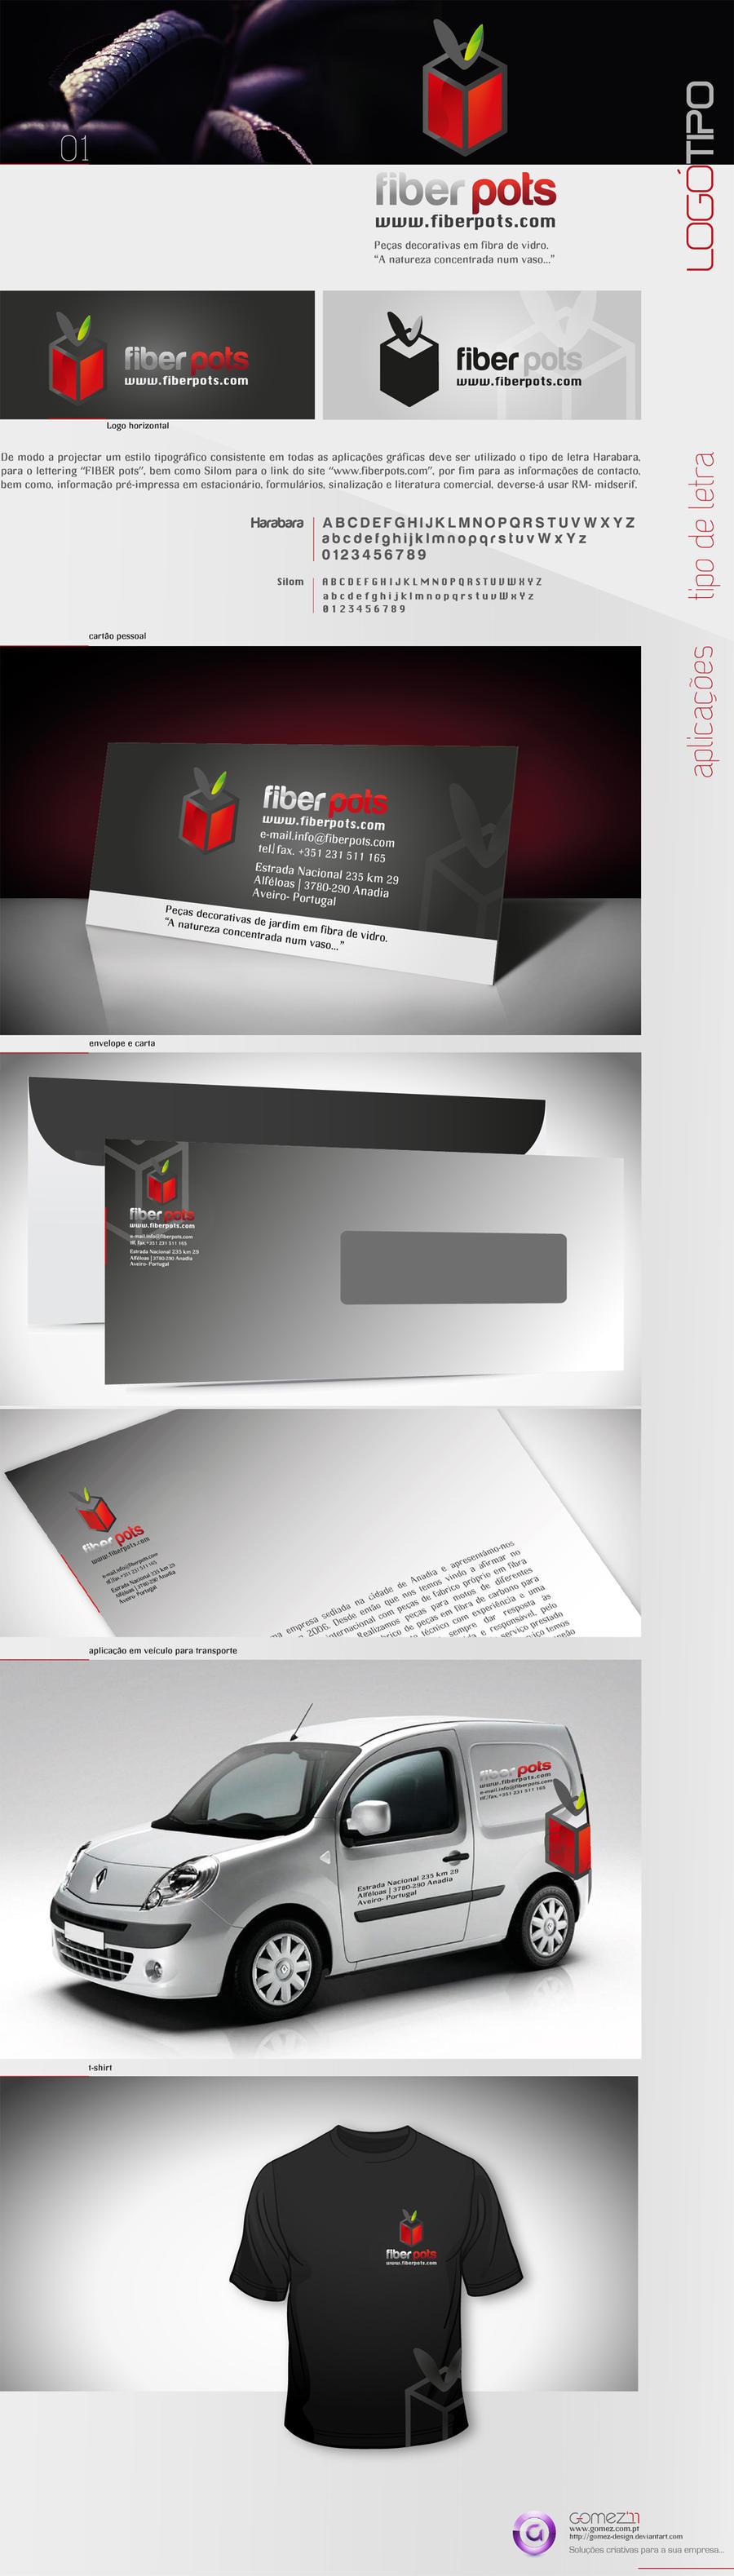 fiberpots_identity by gomez-design